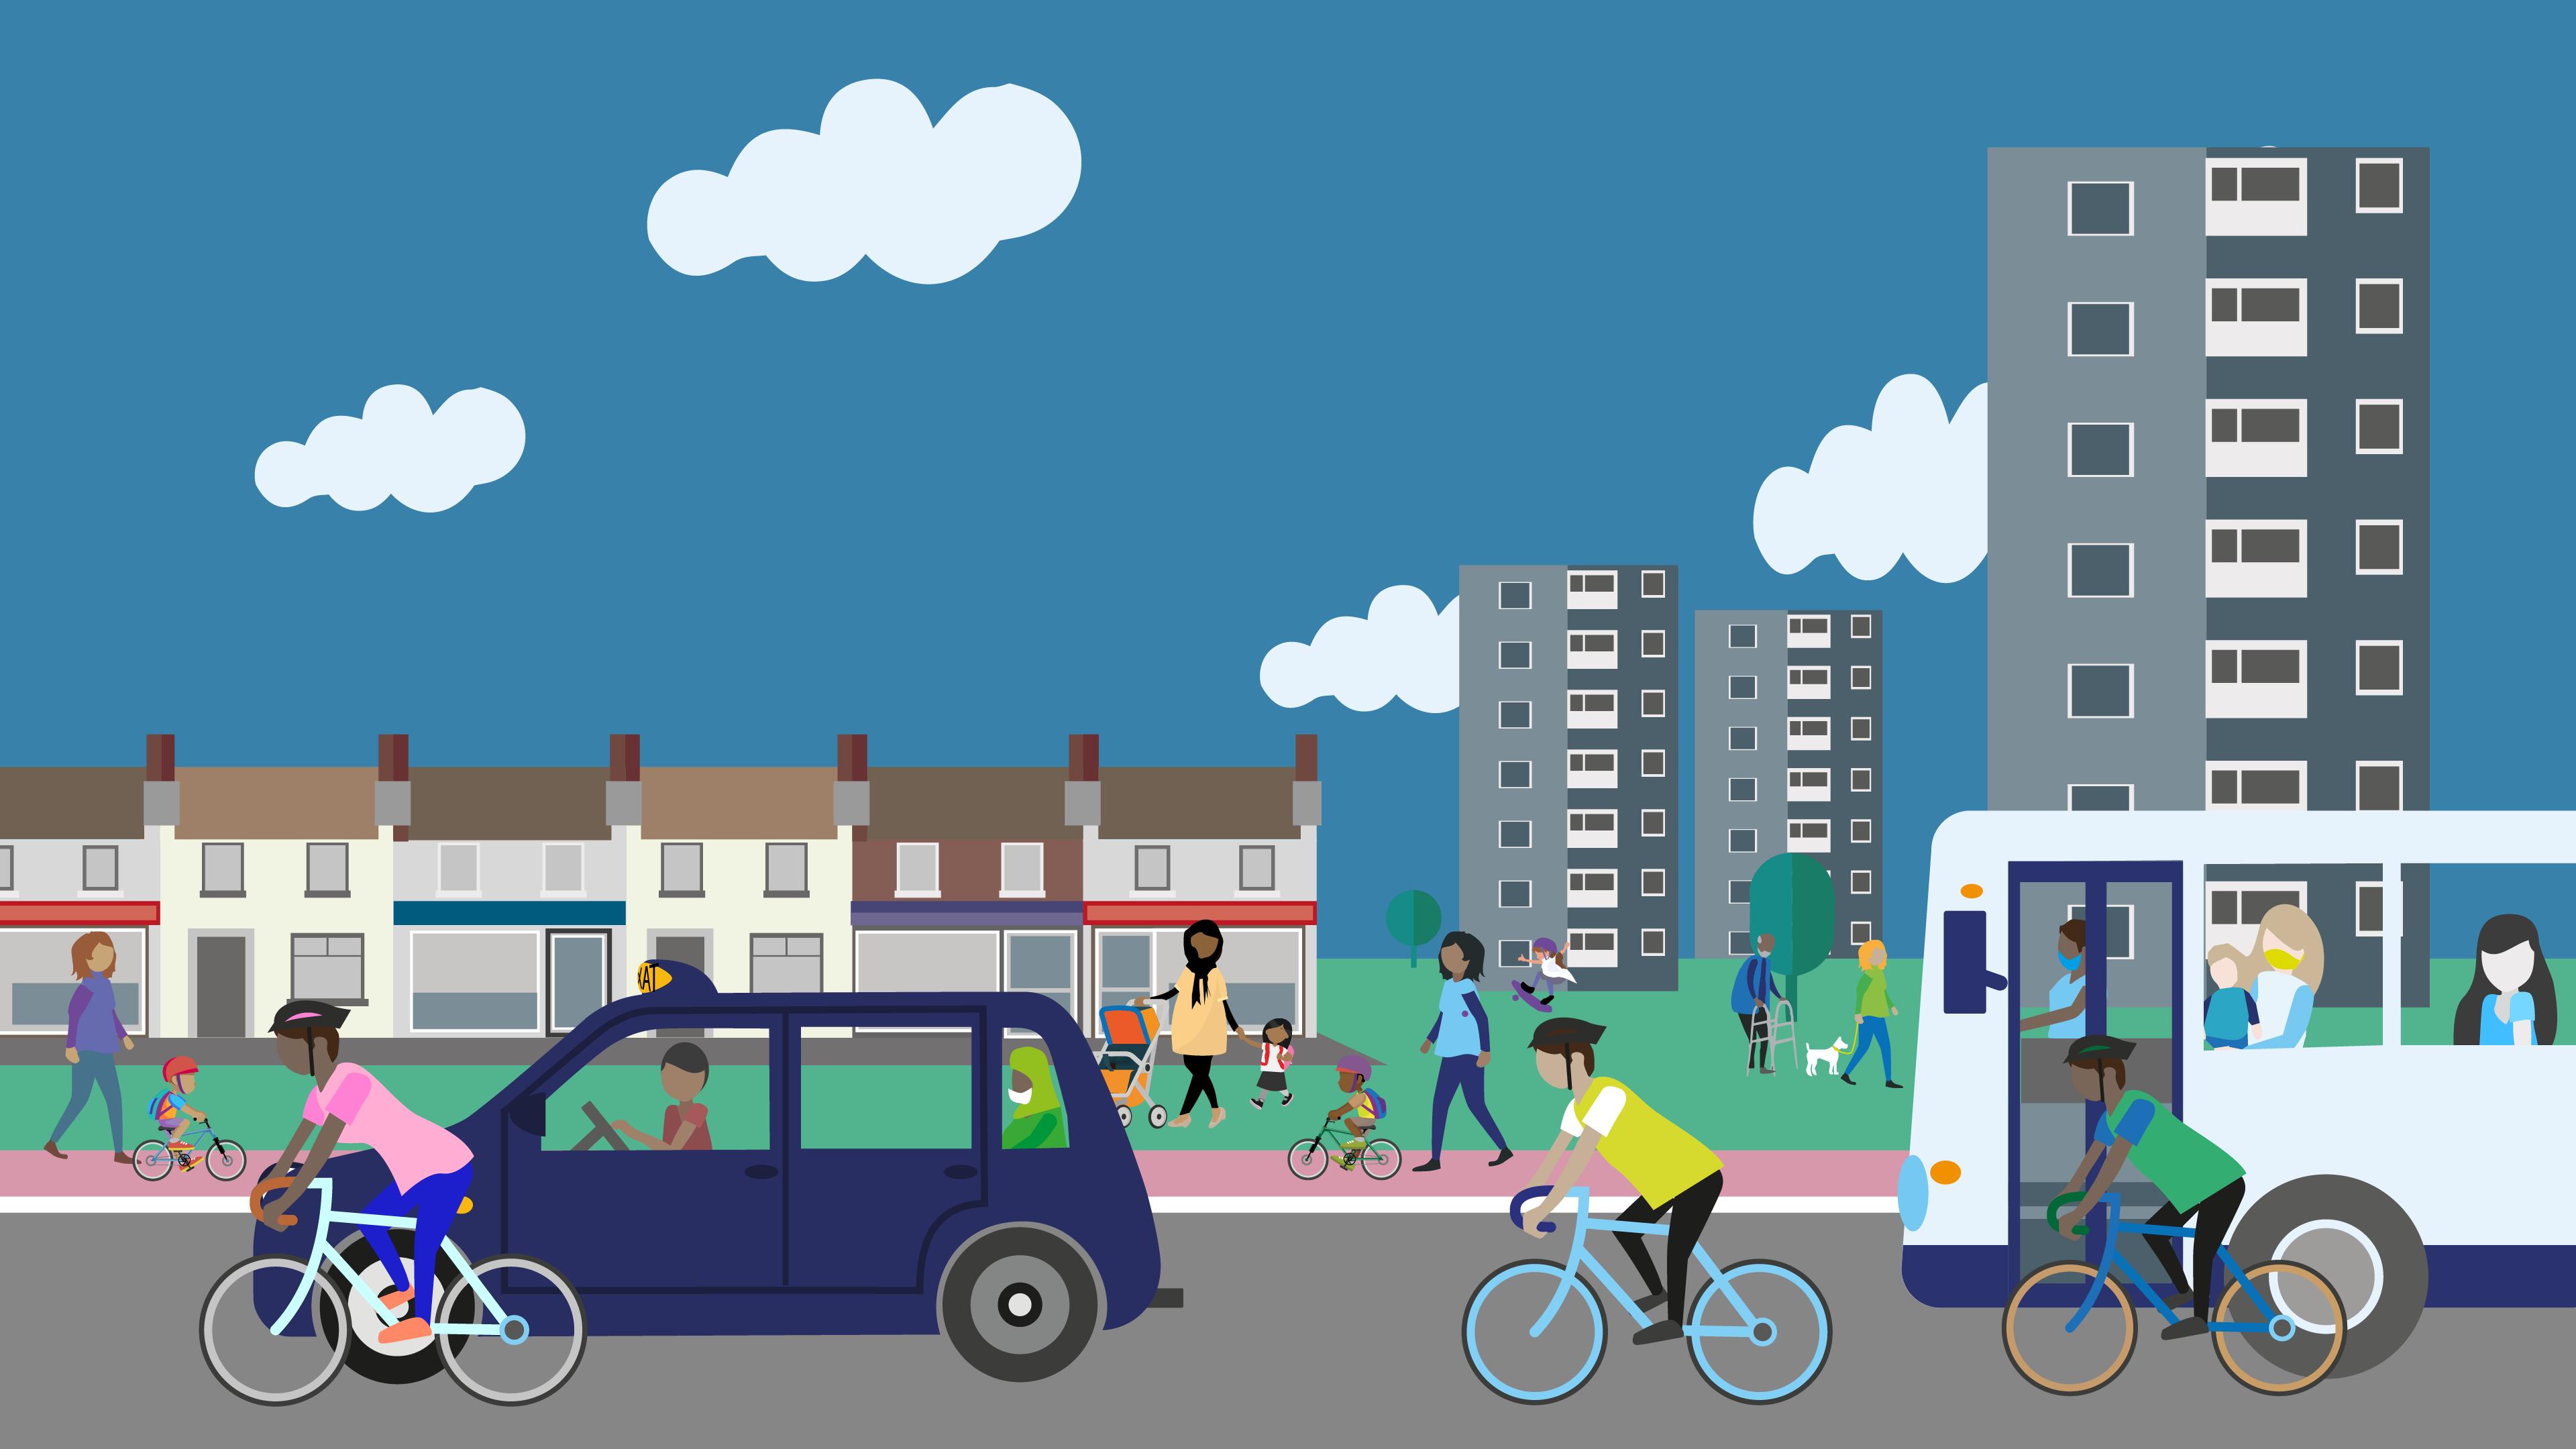 Street scene illustration showing people and public transport